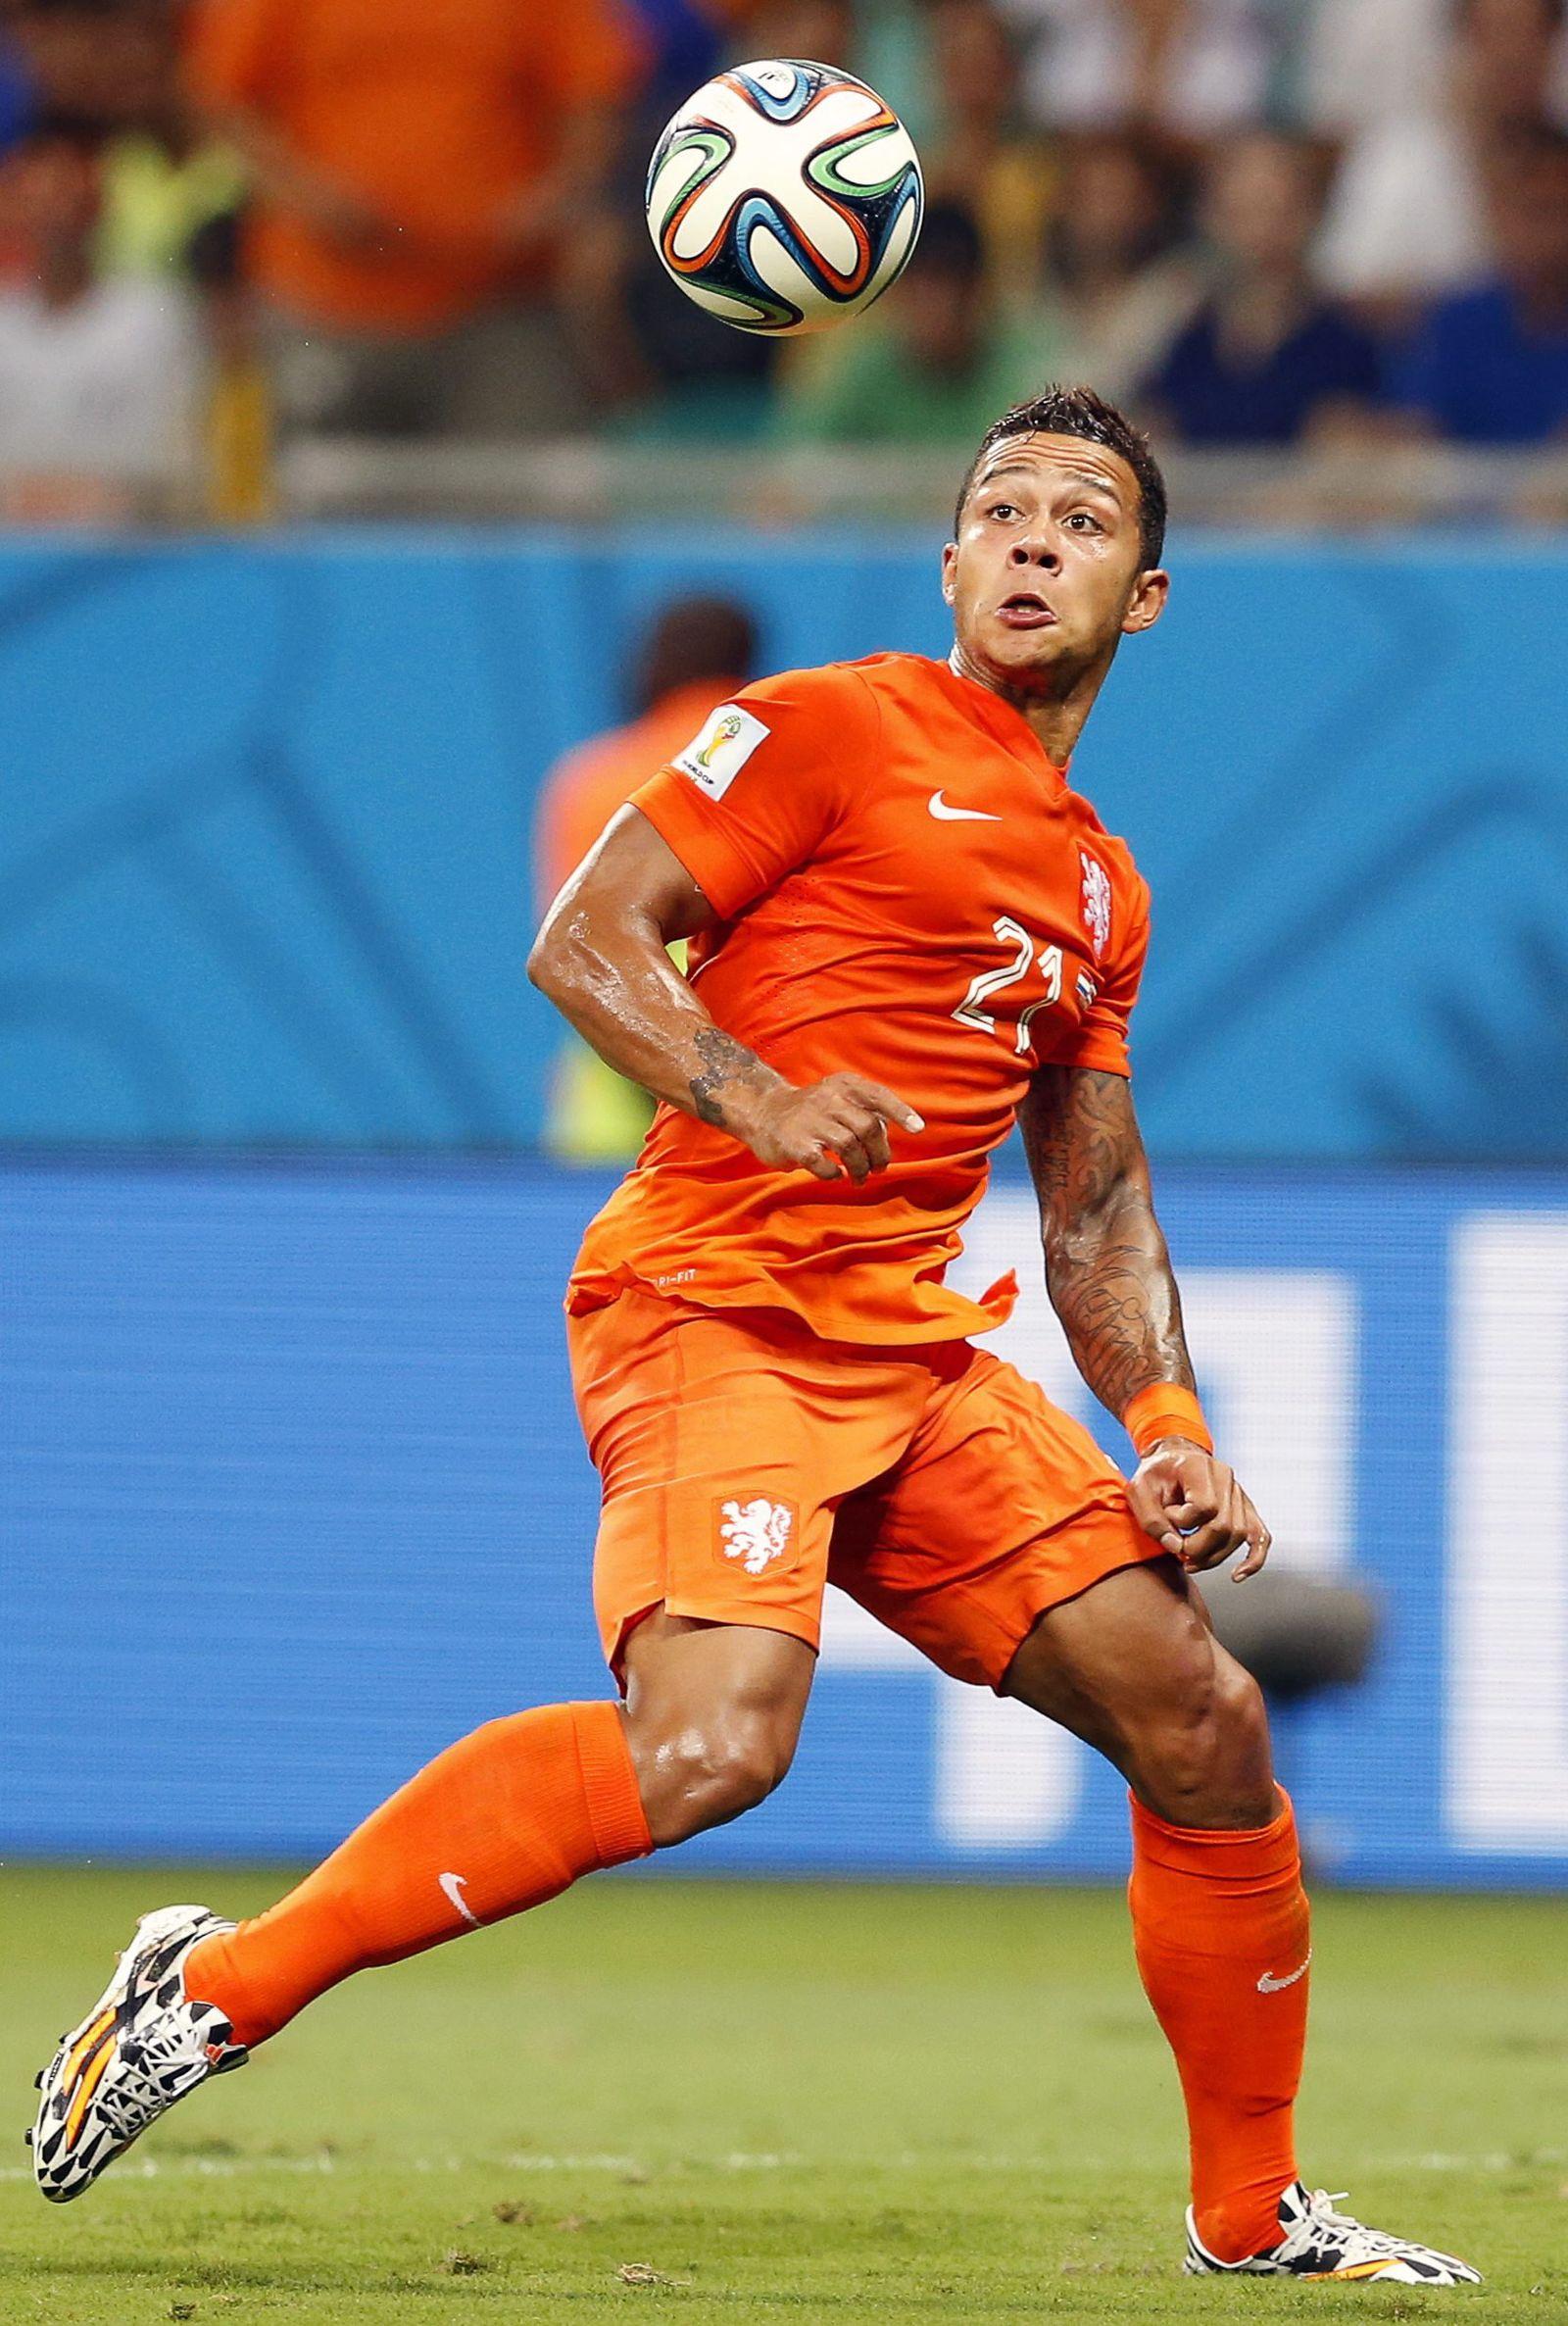 Manchester United sign Dutch forward Memphis Depay